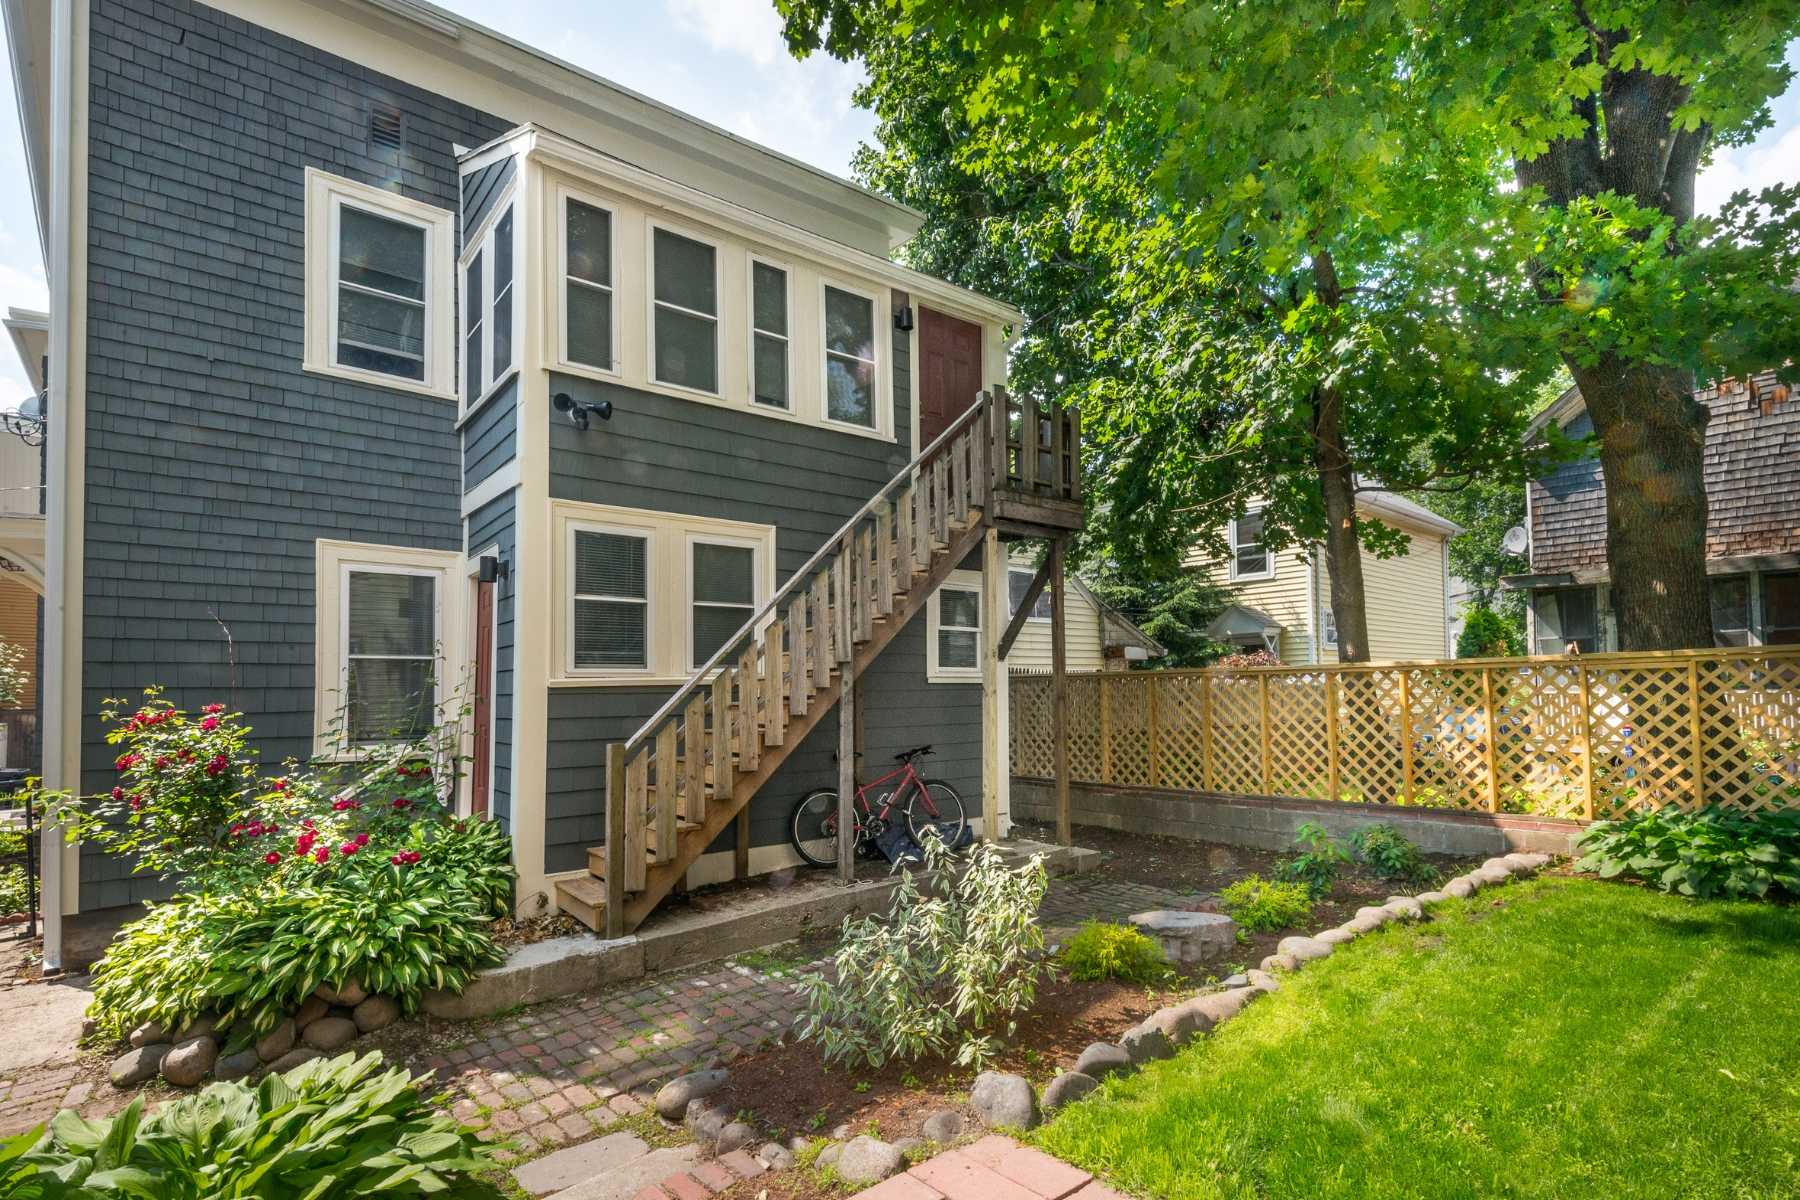 4-CapstoneCommunities-property-Riverside-Place-Apartments-Cambridge.jpg